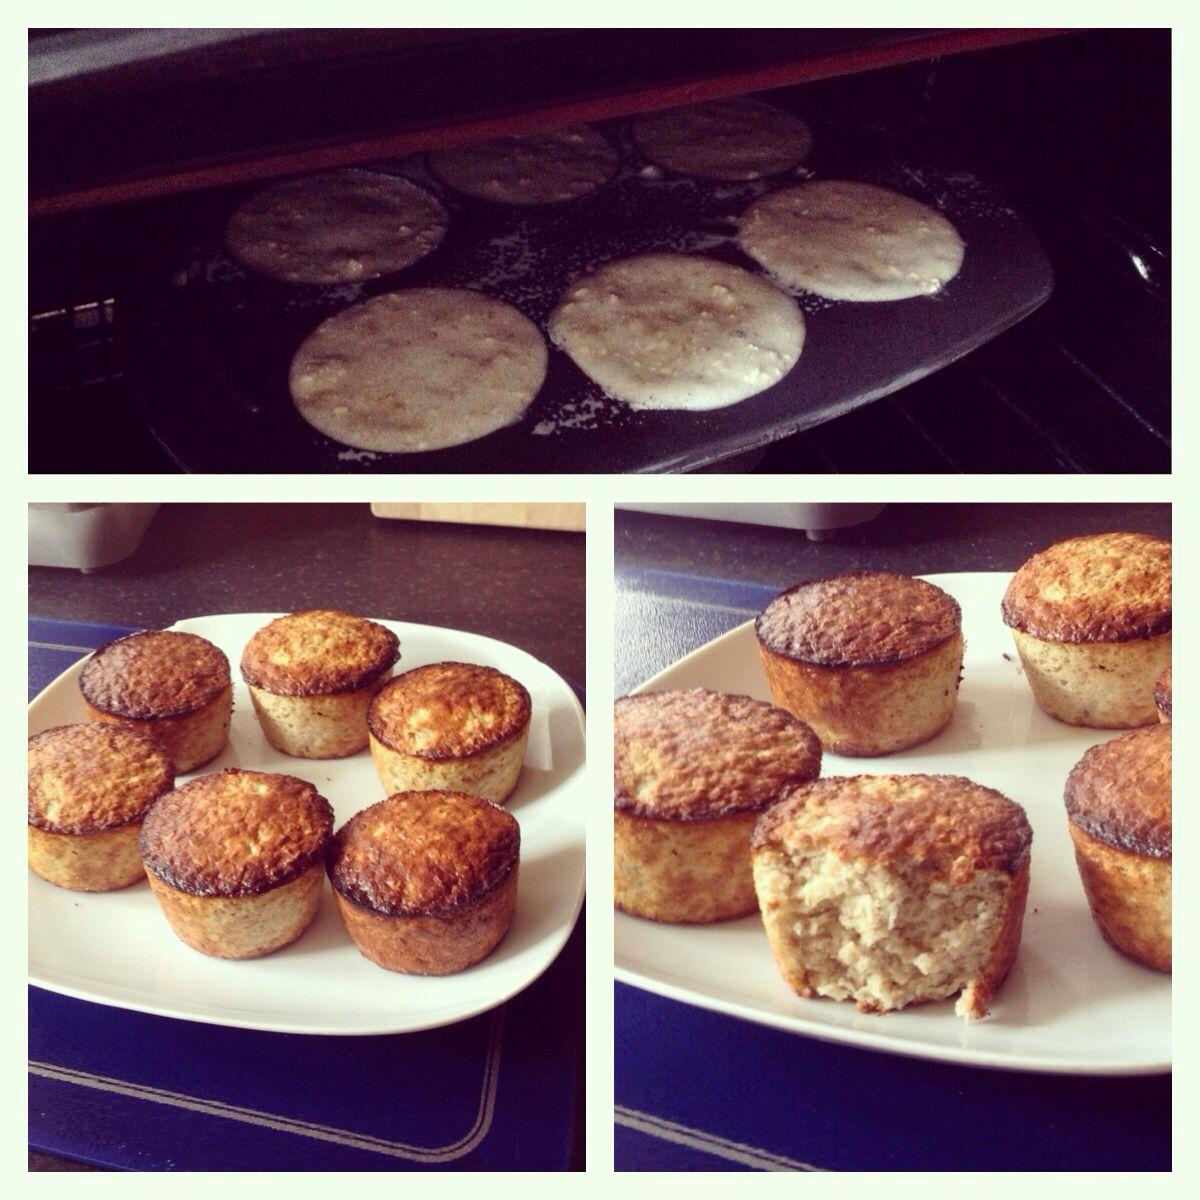 Banana flapjack style slimming world muffins 140g oats 3 eggs 2 mushed bananas Sweetener Nutmeg ...